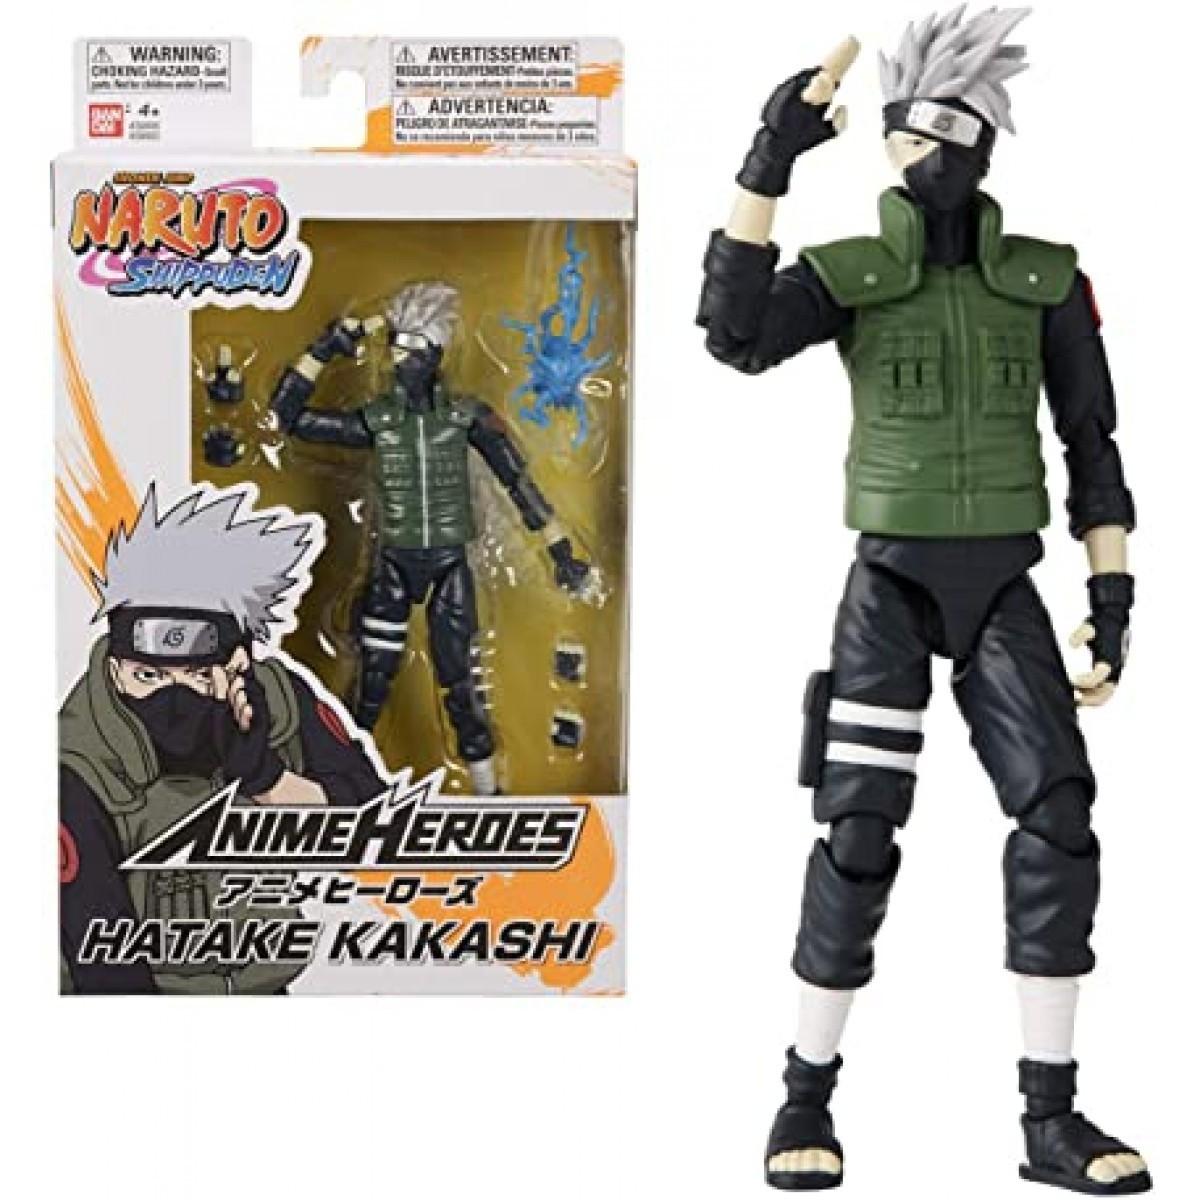 Action Figure: Kakashi Hatake: Naruto Shippuden (Anime Heroes) Anime Mangá - Bandai